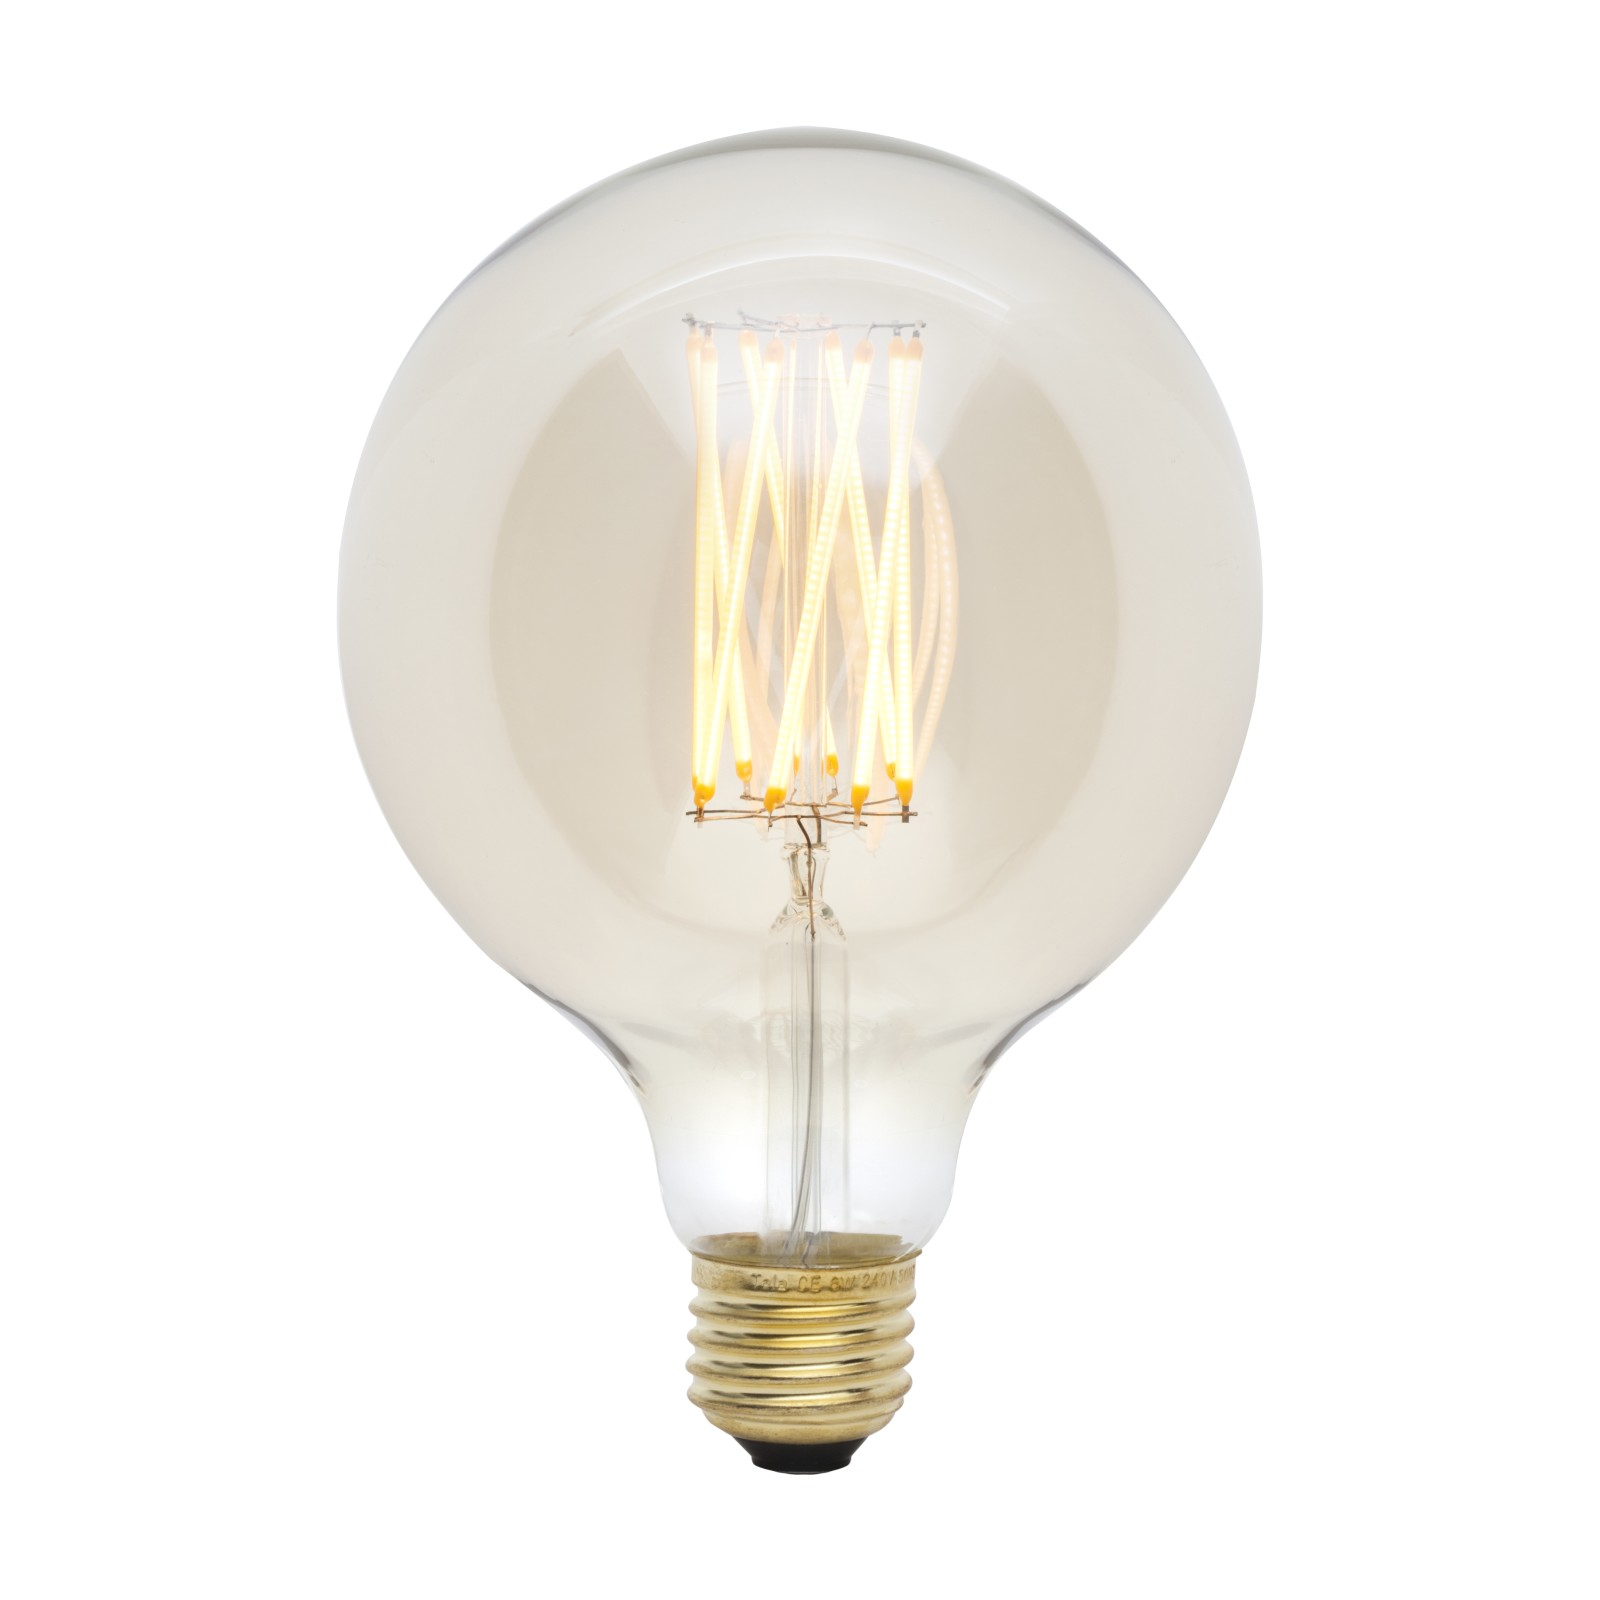 Gaia 6W LED lightbulb Gaia 6 W LED lightbub